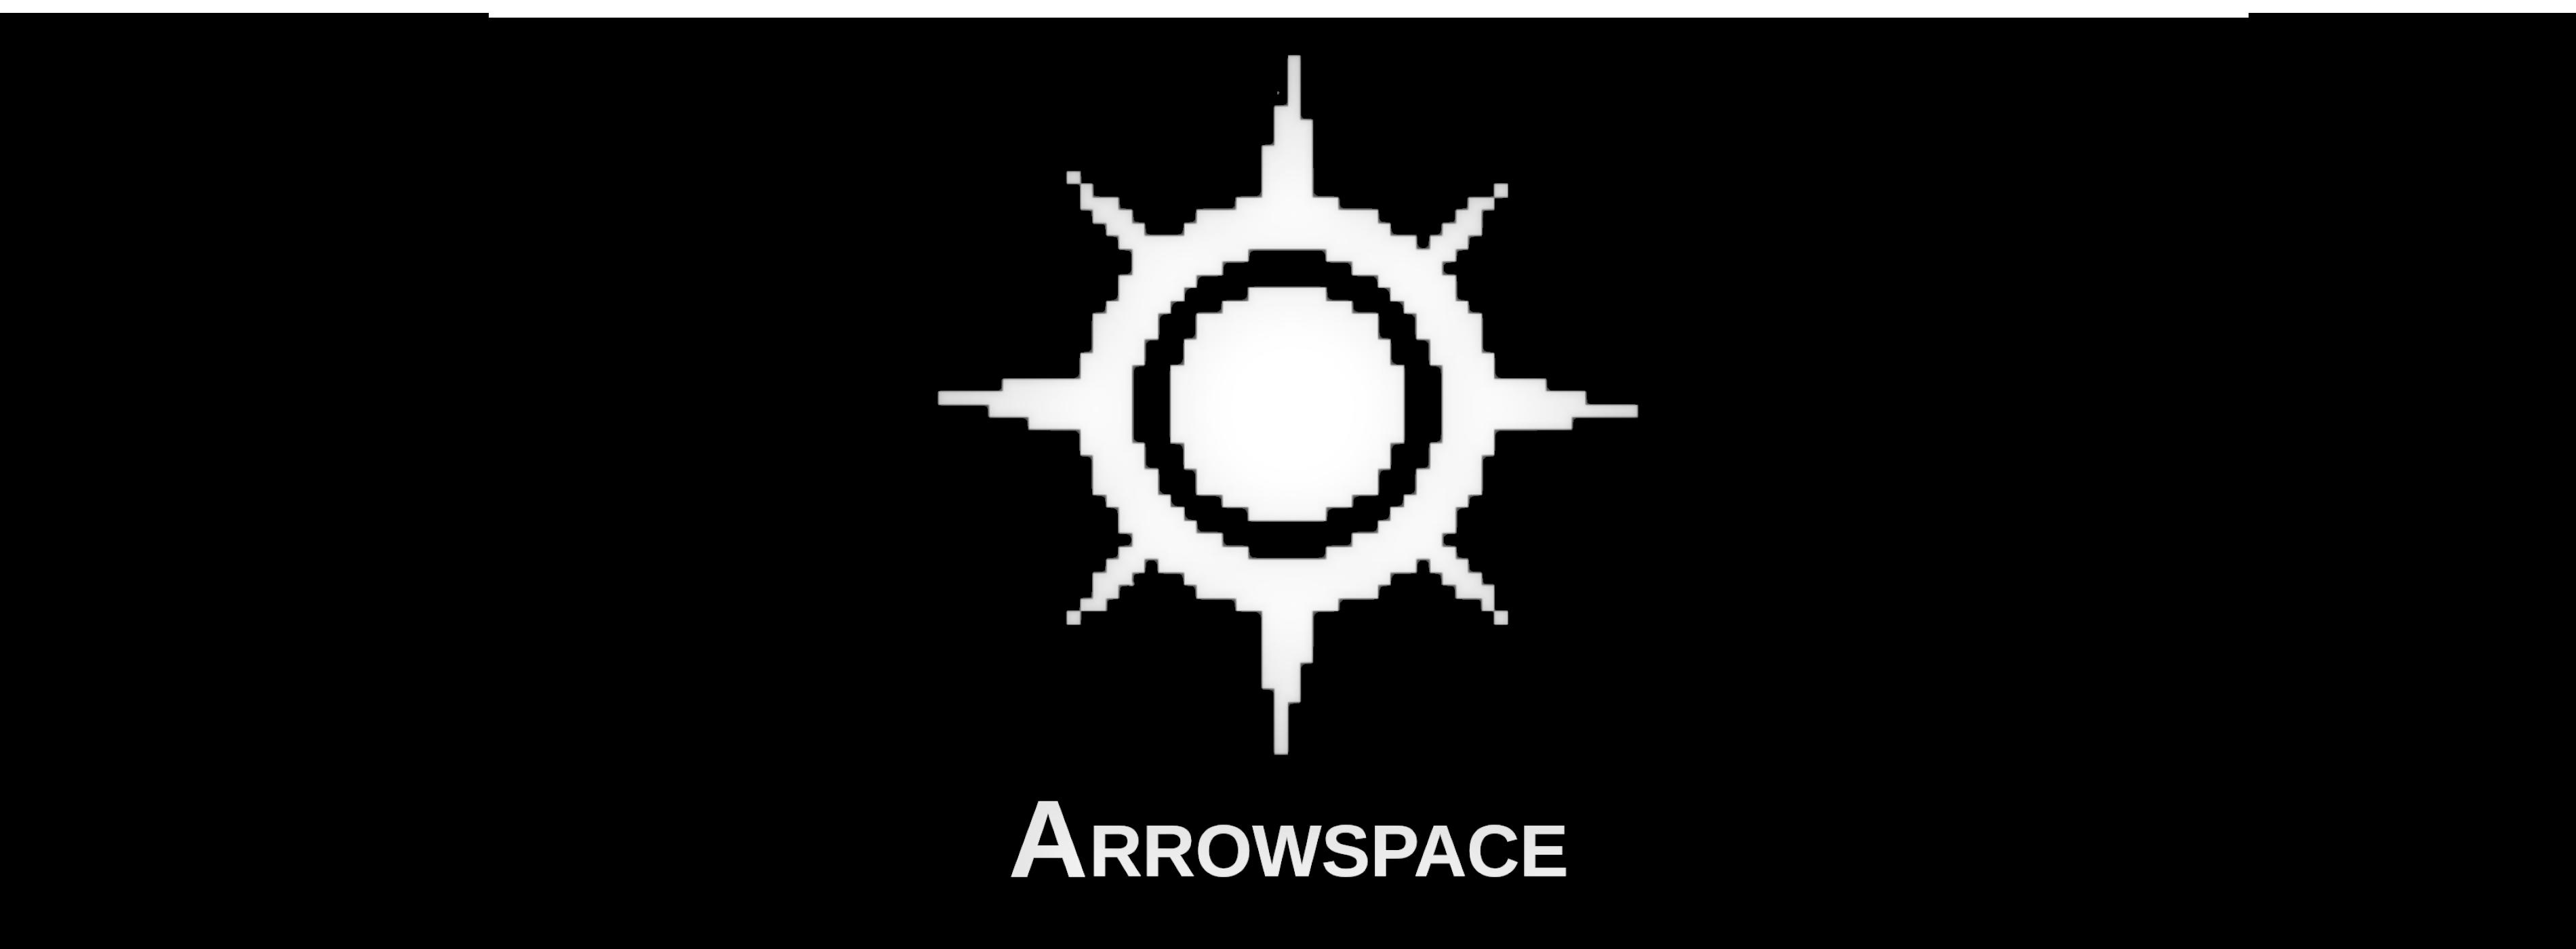 Arrowspace